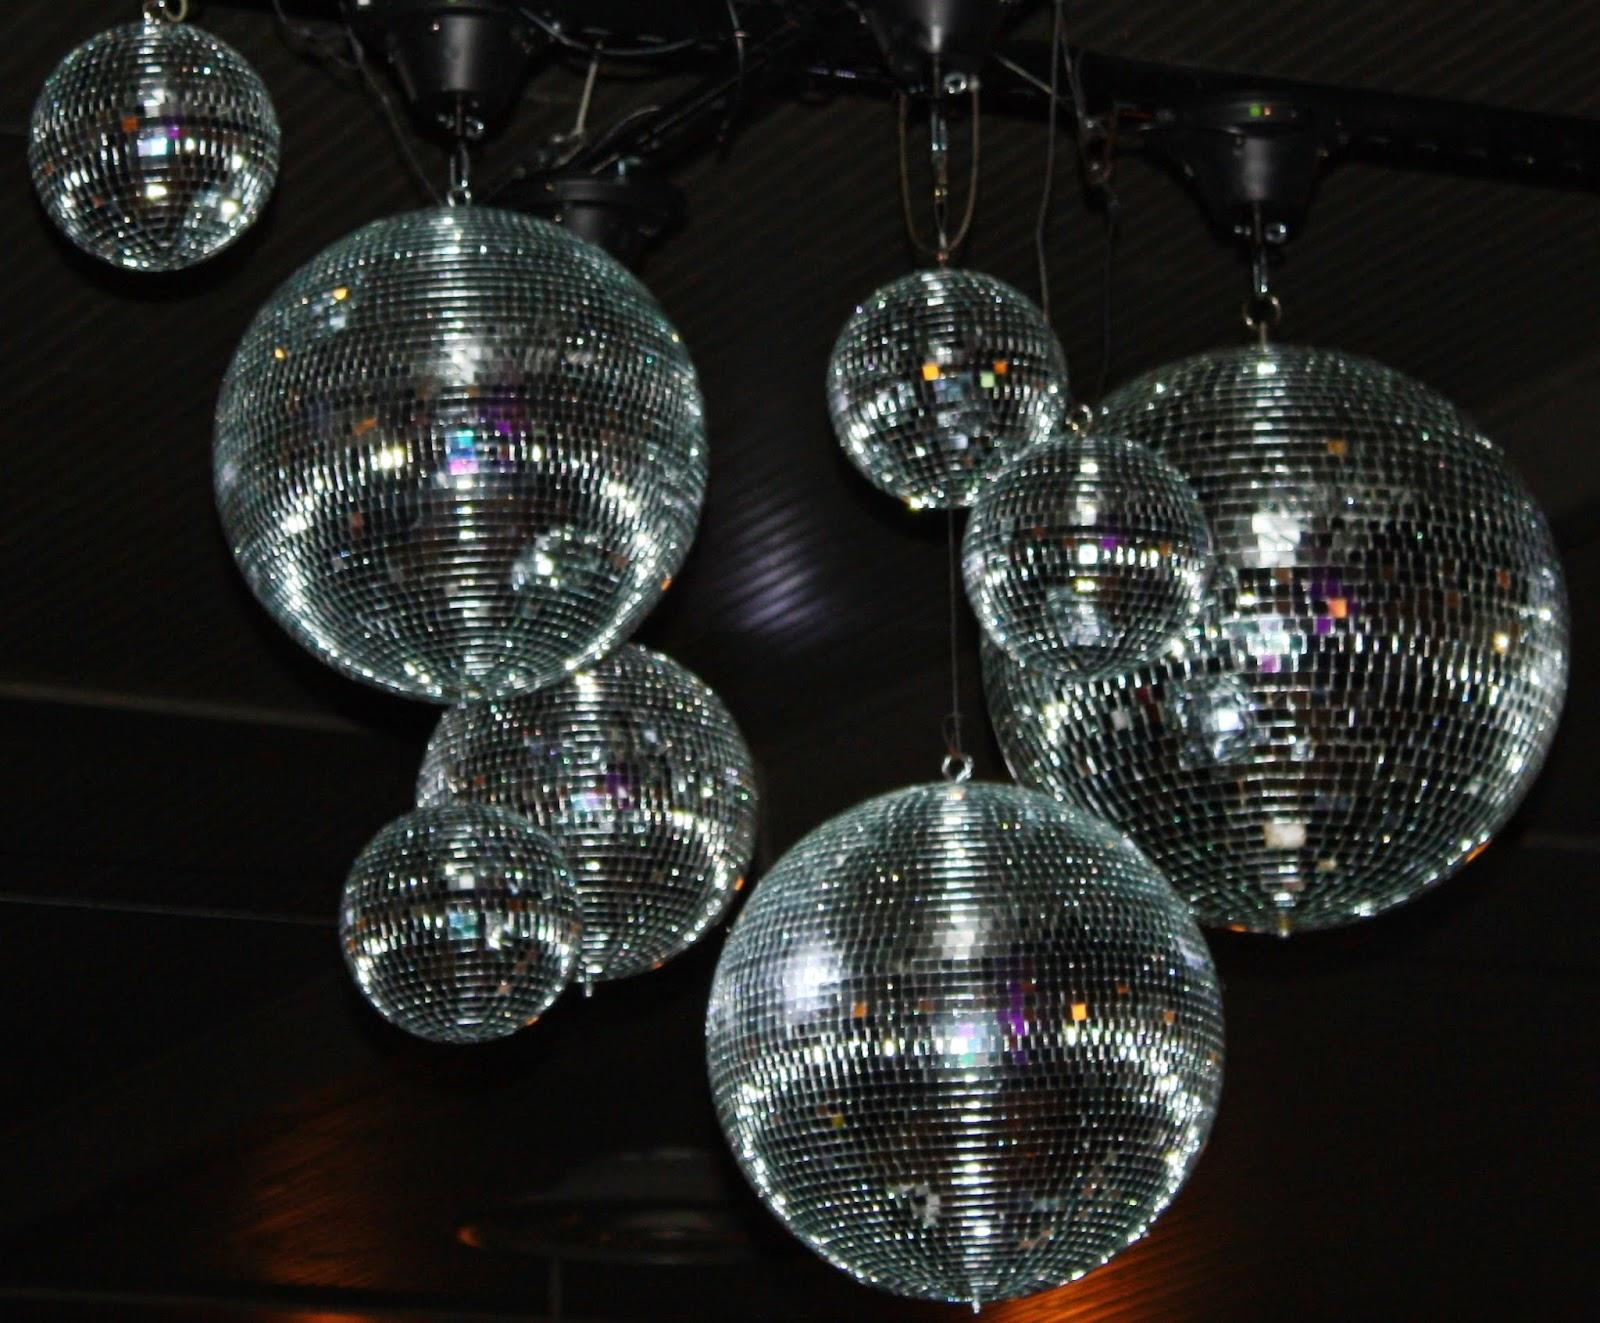 Dia events taste of billings 2015 at the billings depot mirror ball chandelier arubaitofo Gallery